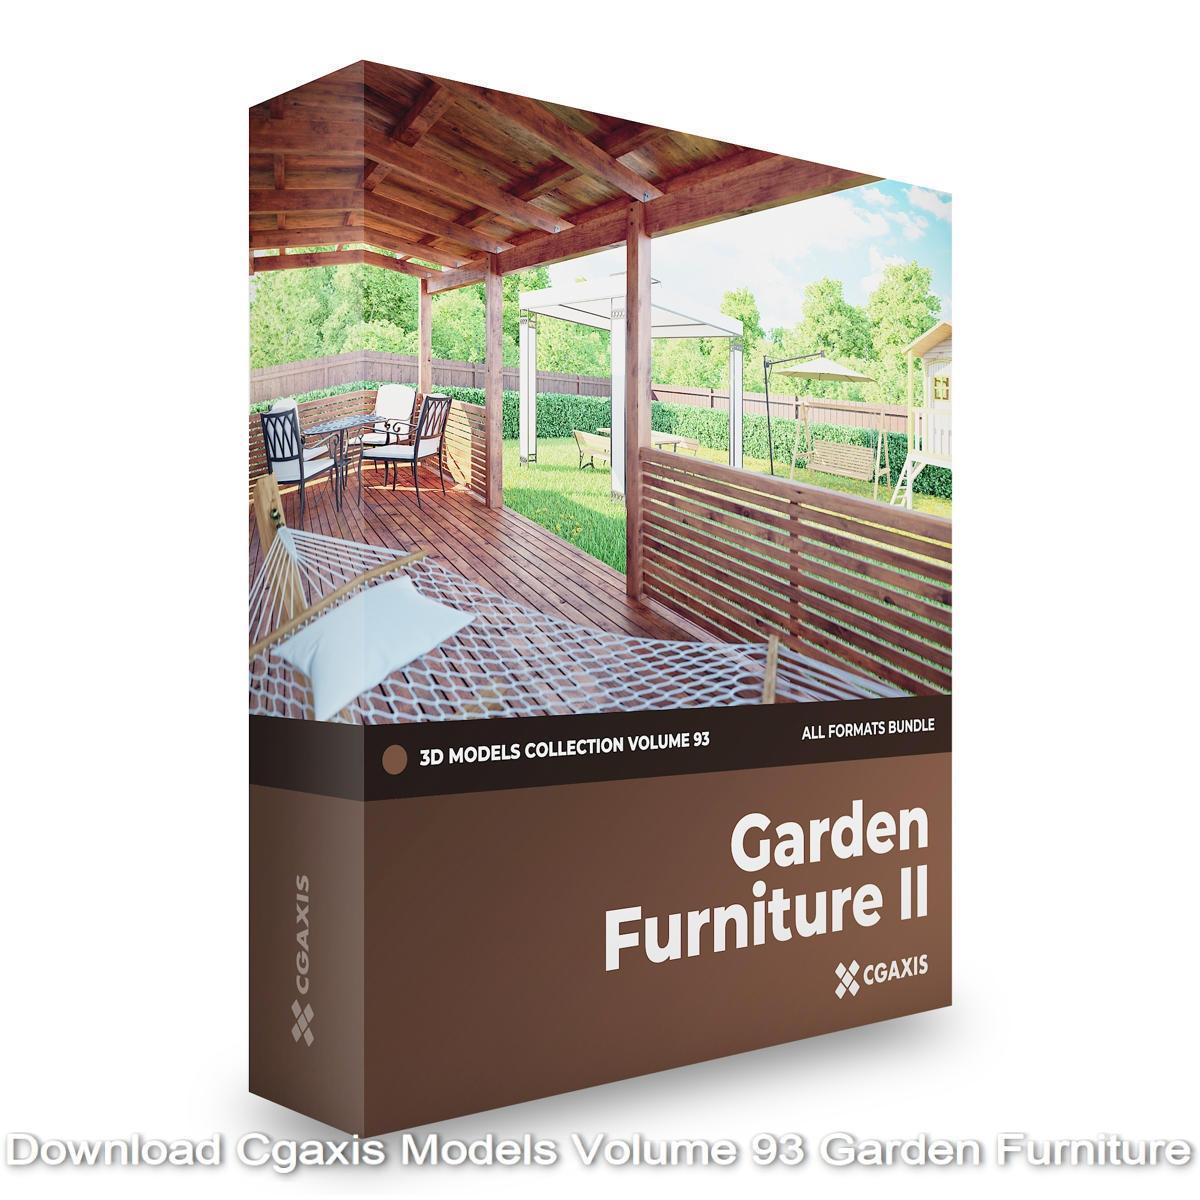 Download Cgaxis Models Volume 93 Garden Furniture